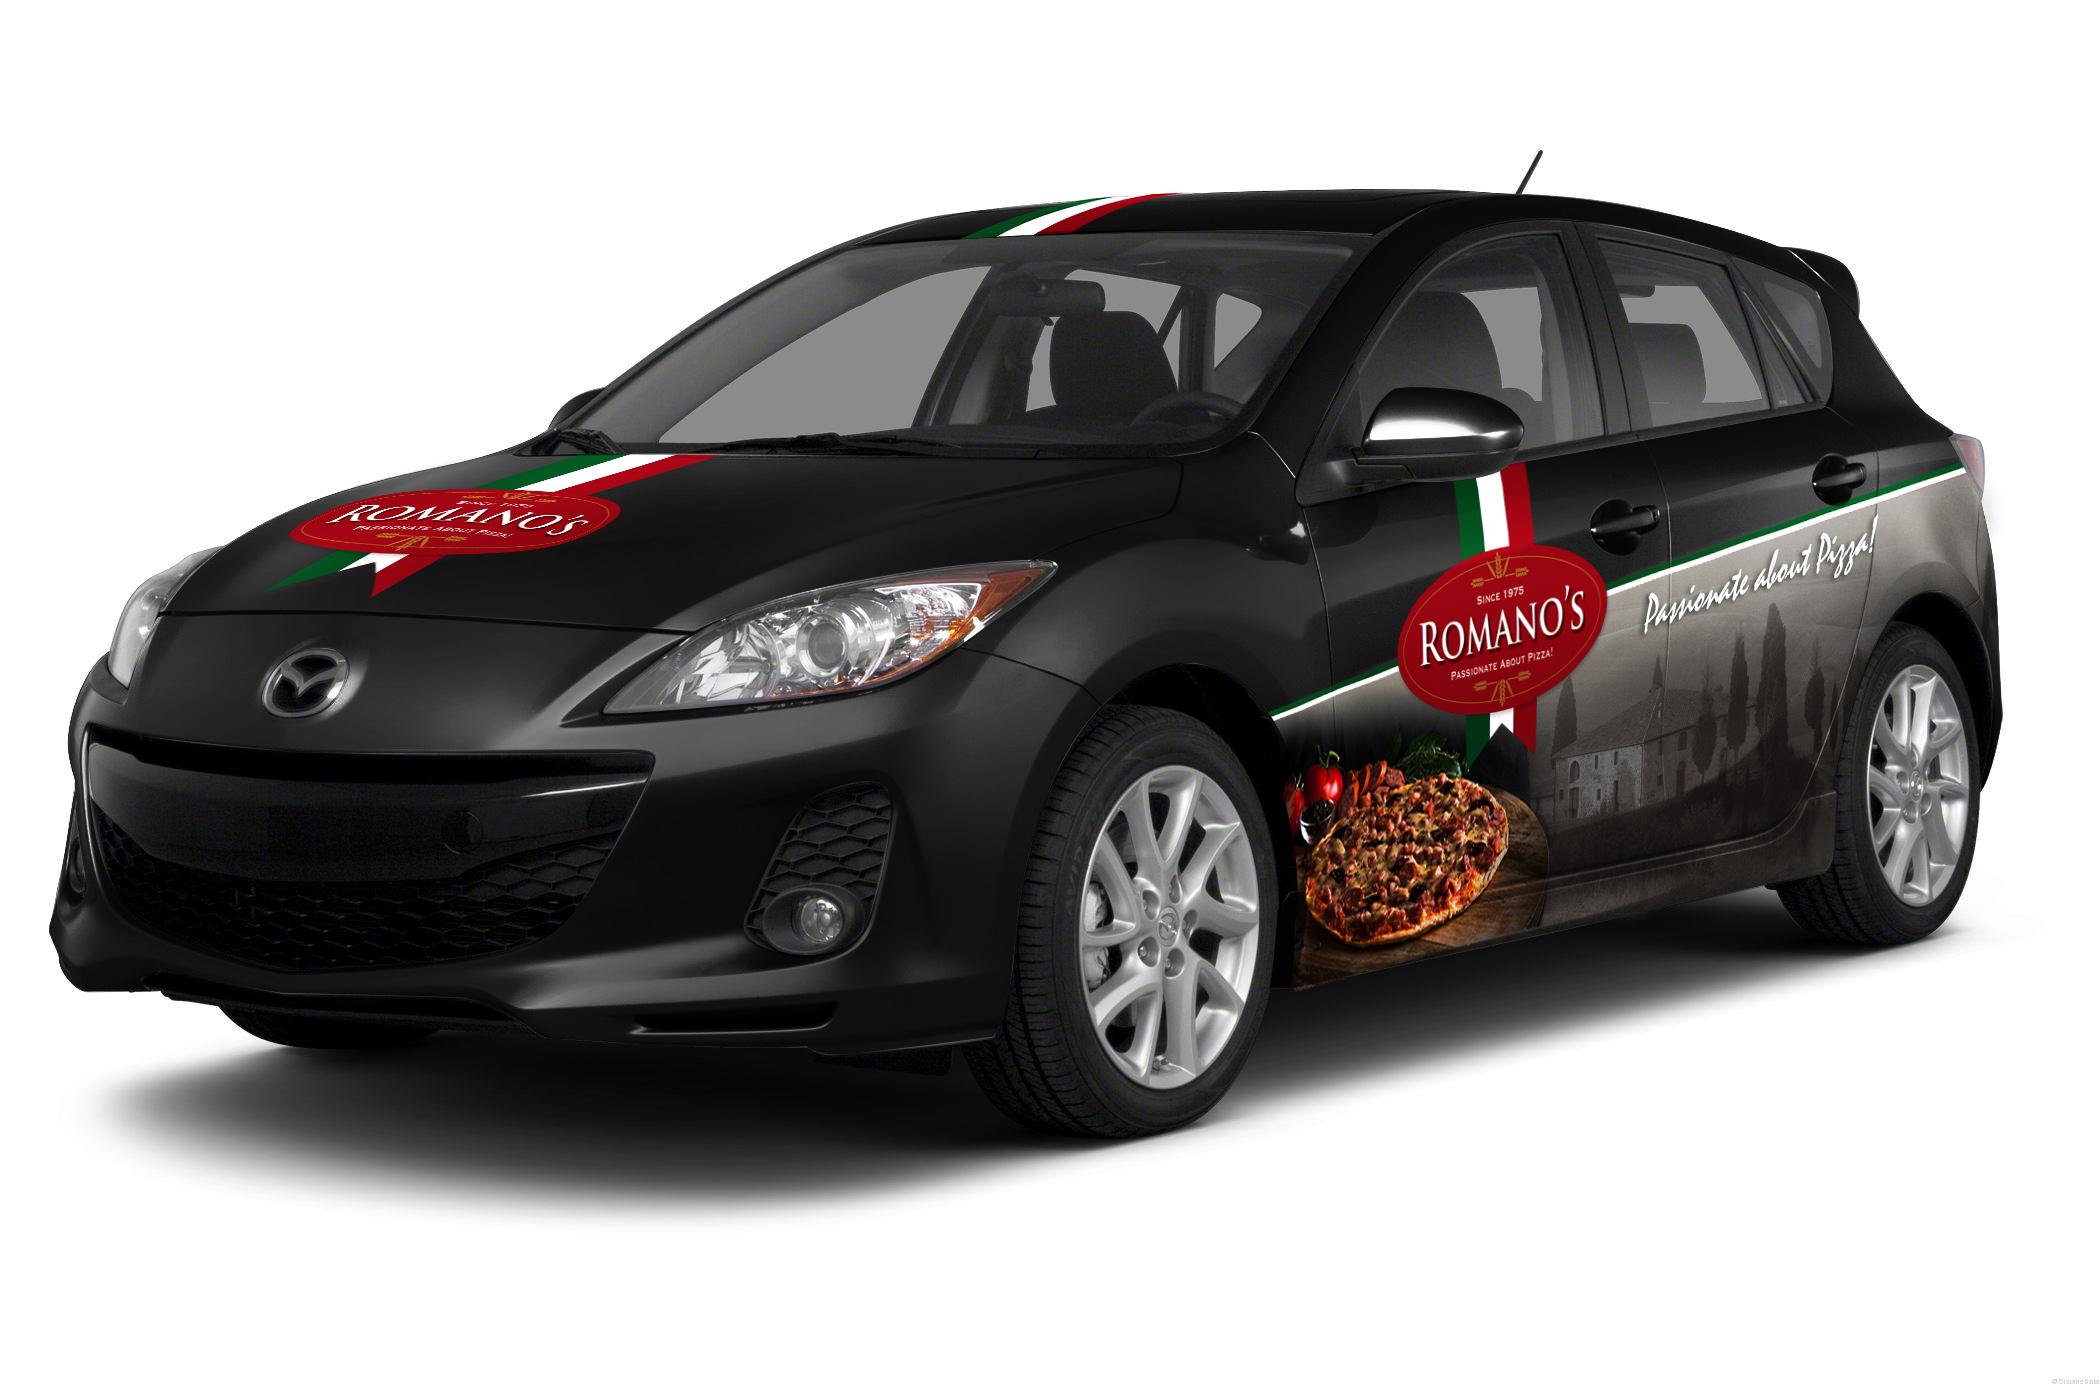 Romanos-Mazda3-Front3QTR.jpg